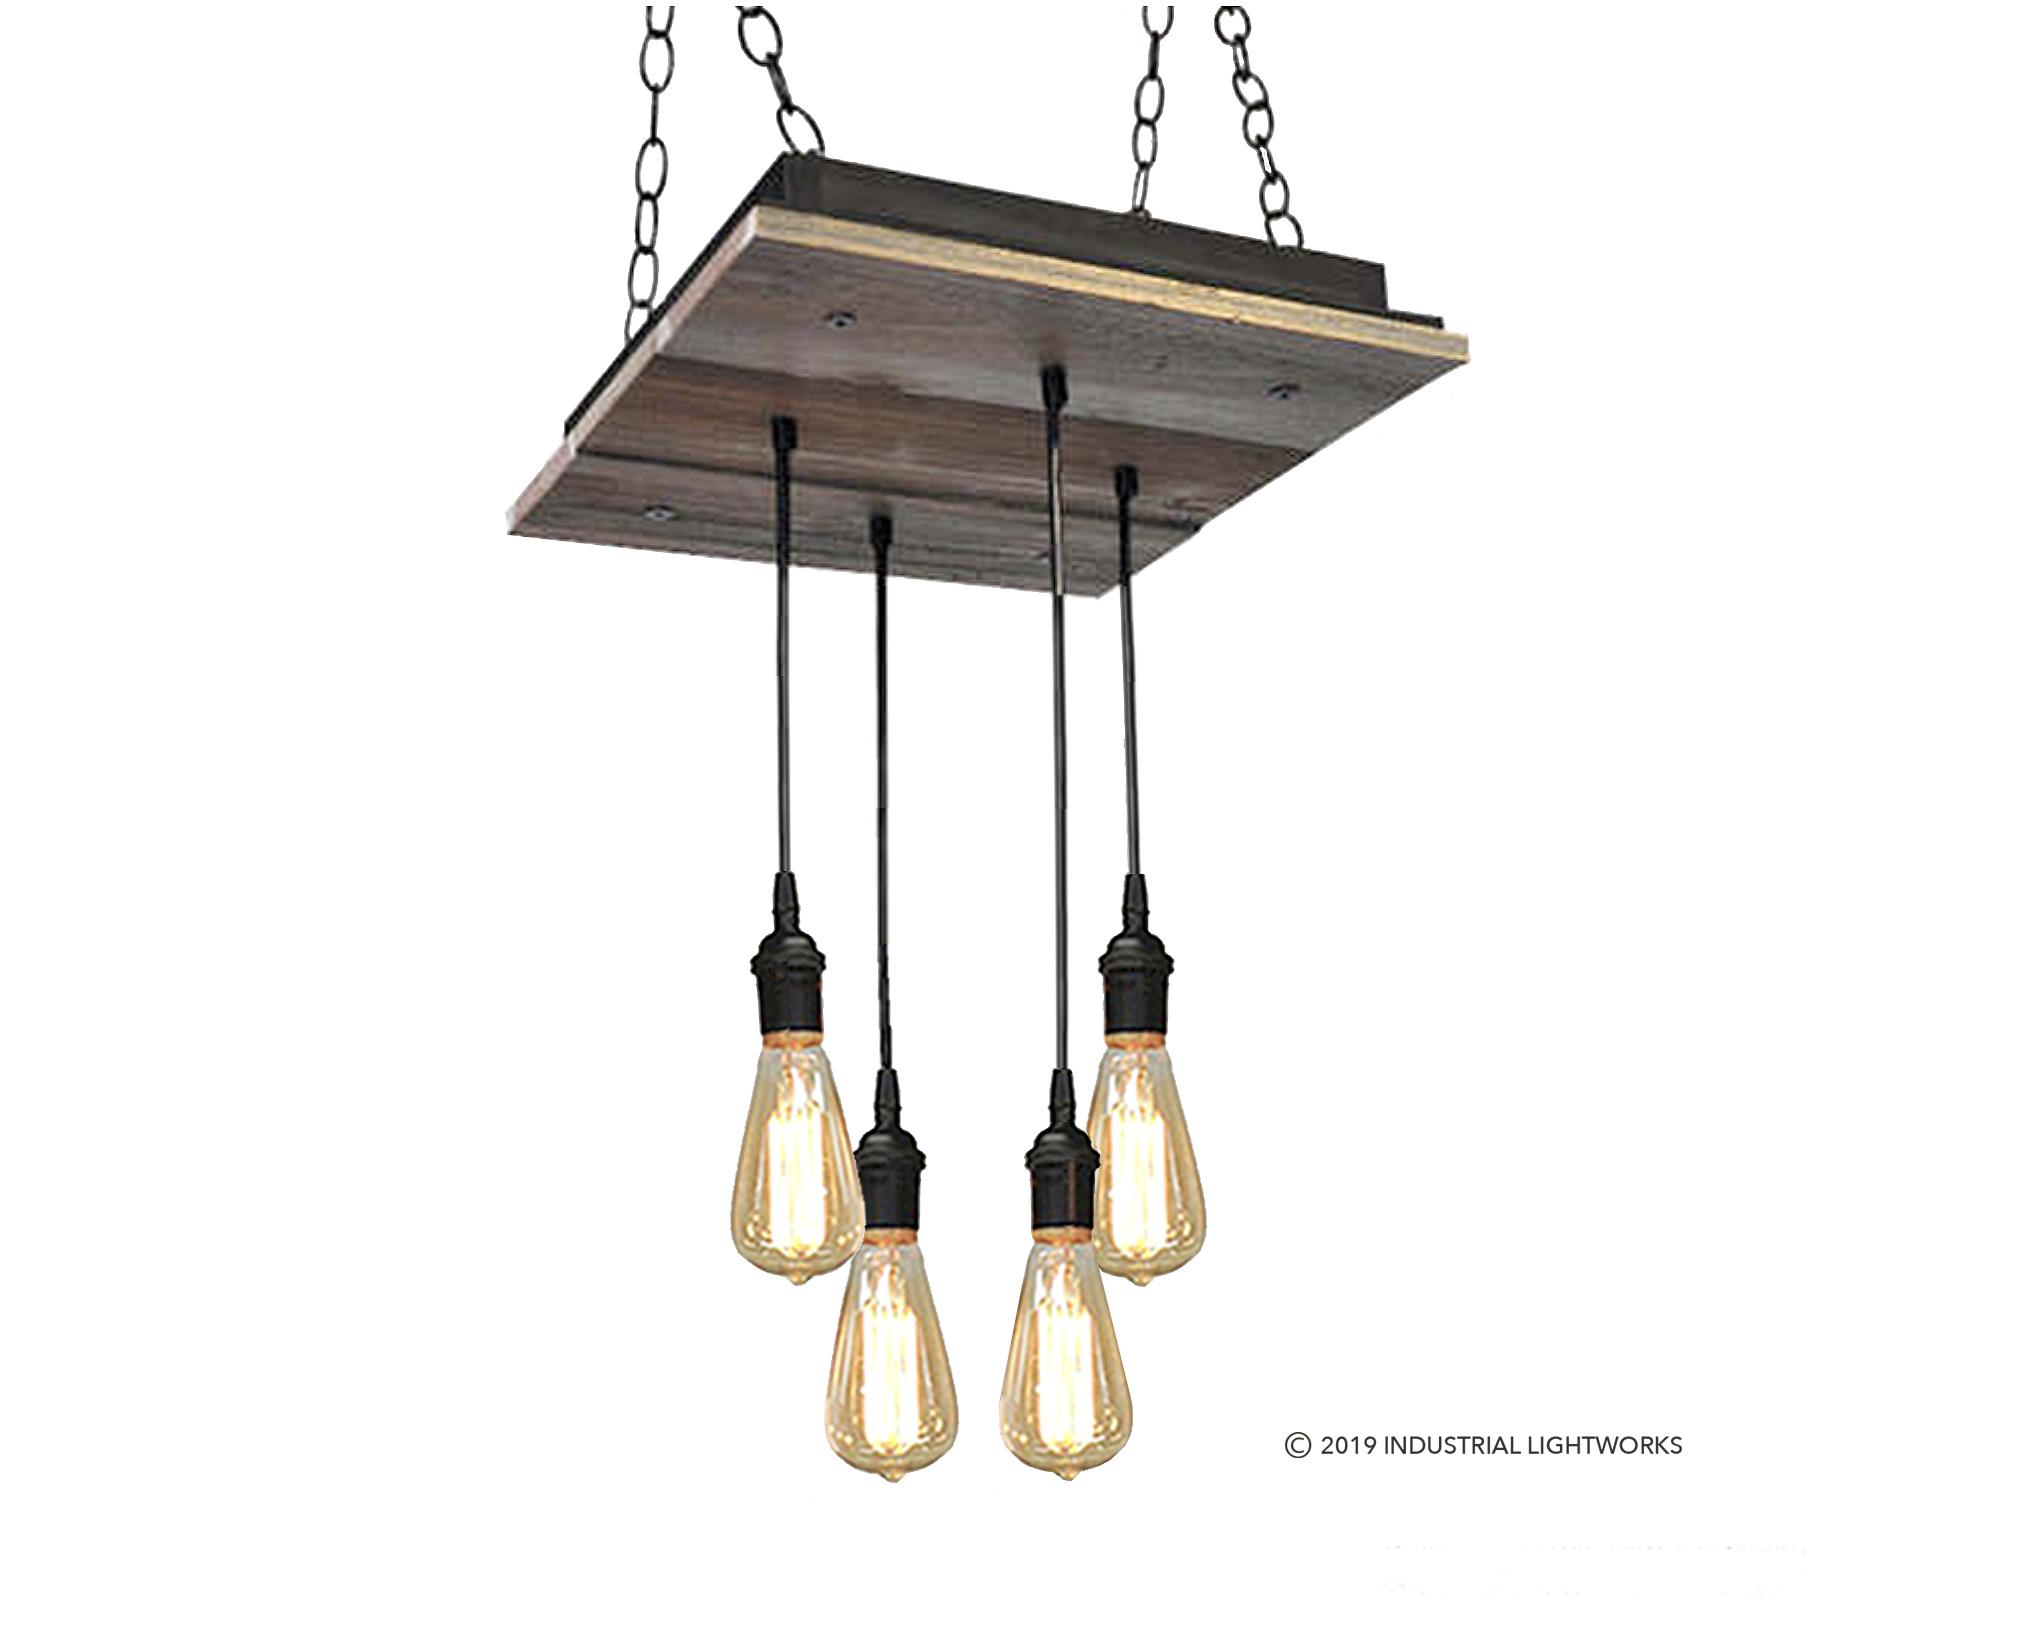 4 Light - Reclaimed Wood Chandelier